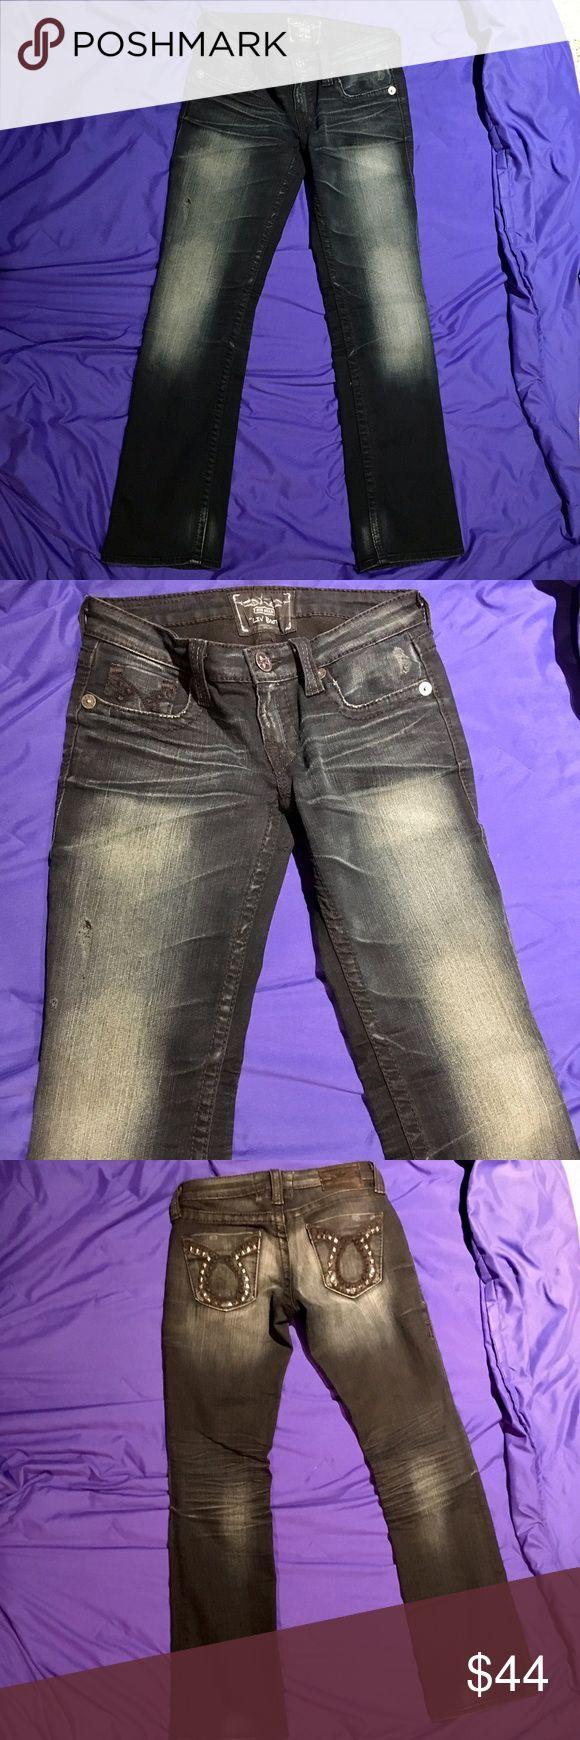 "BIG STAR ""LIV BOOT"" WOMENS JEANS BIG STAR ""LIV BOOT"" WOMENS JEANS SIZE 26 R WORN ONLY A FEW TIMES Big Star Jeans Boot Cut"